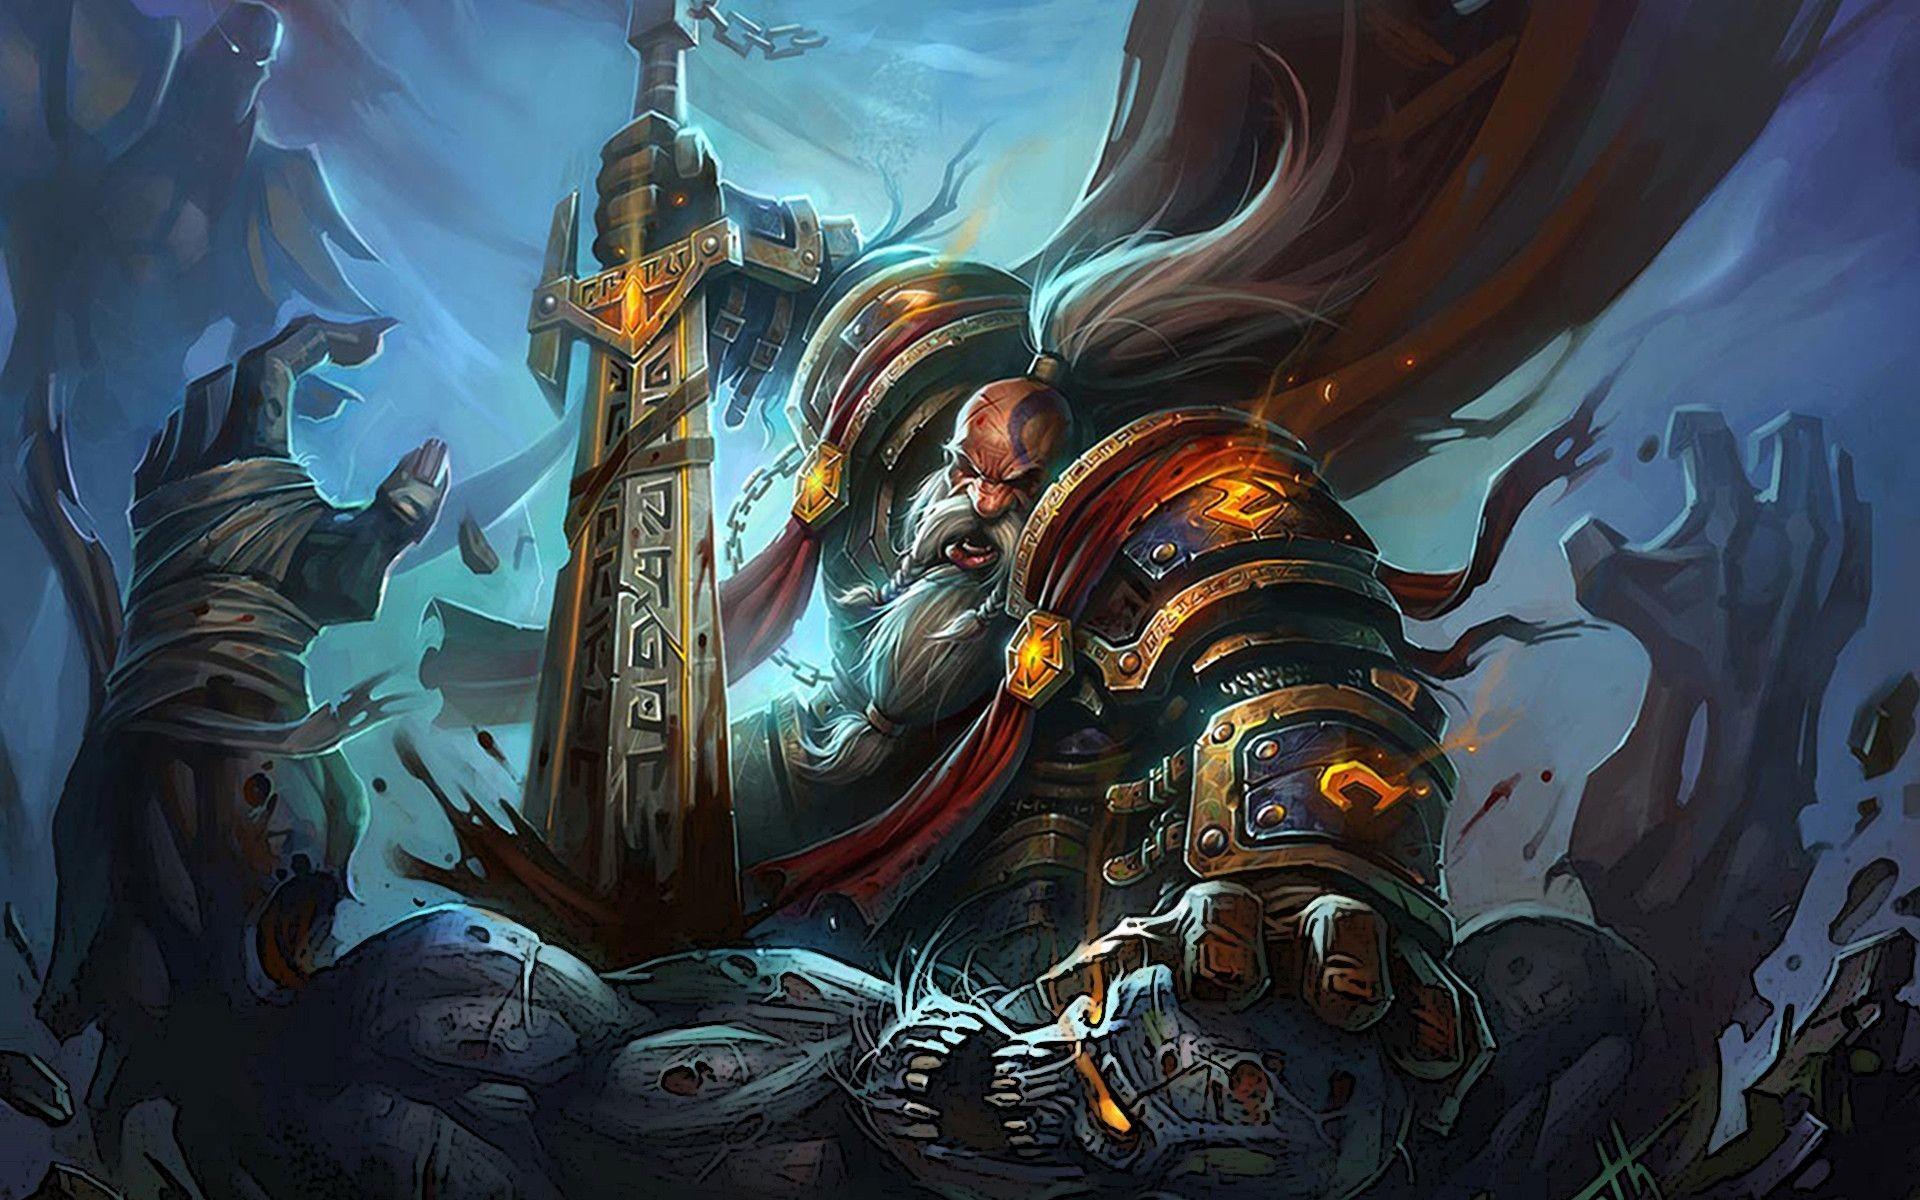 World Of Warcraft Warlords Of Draenor HD Обои Фоны   HD Wallpapers    Pinterest   Wallpaper and Hd wallpaper